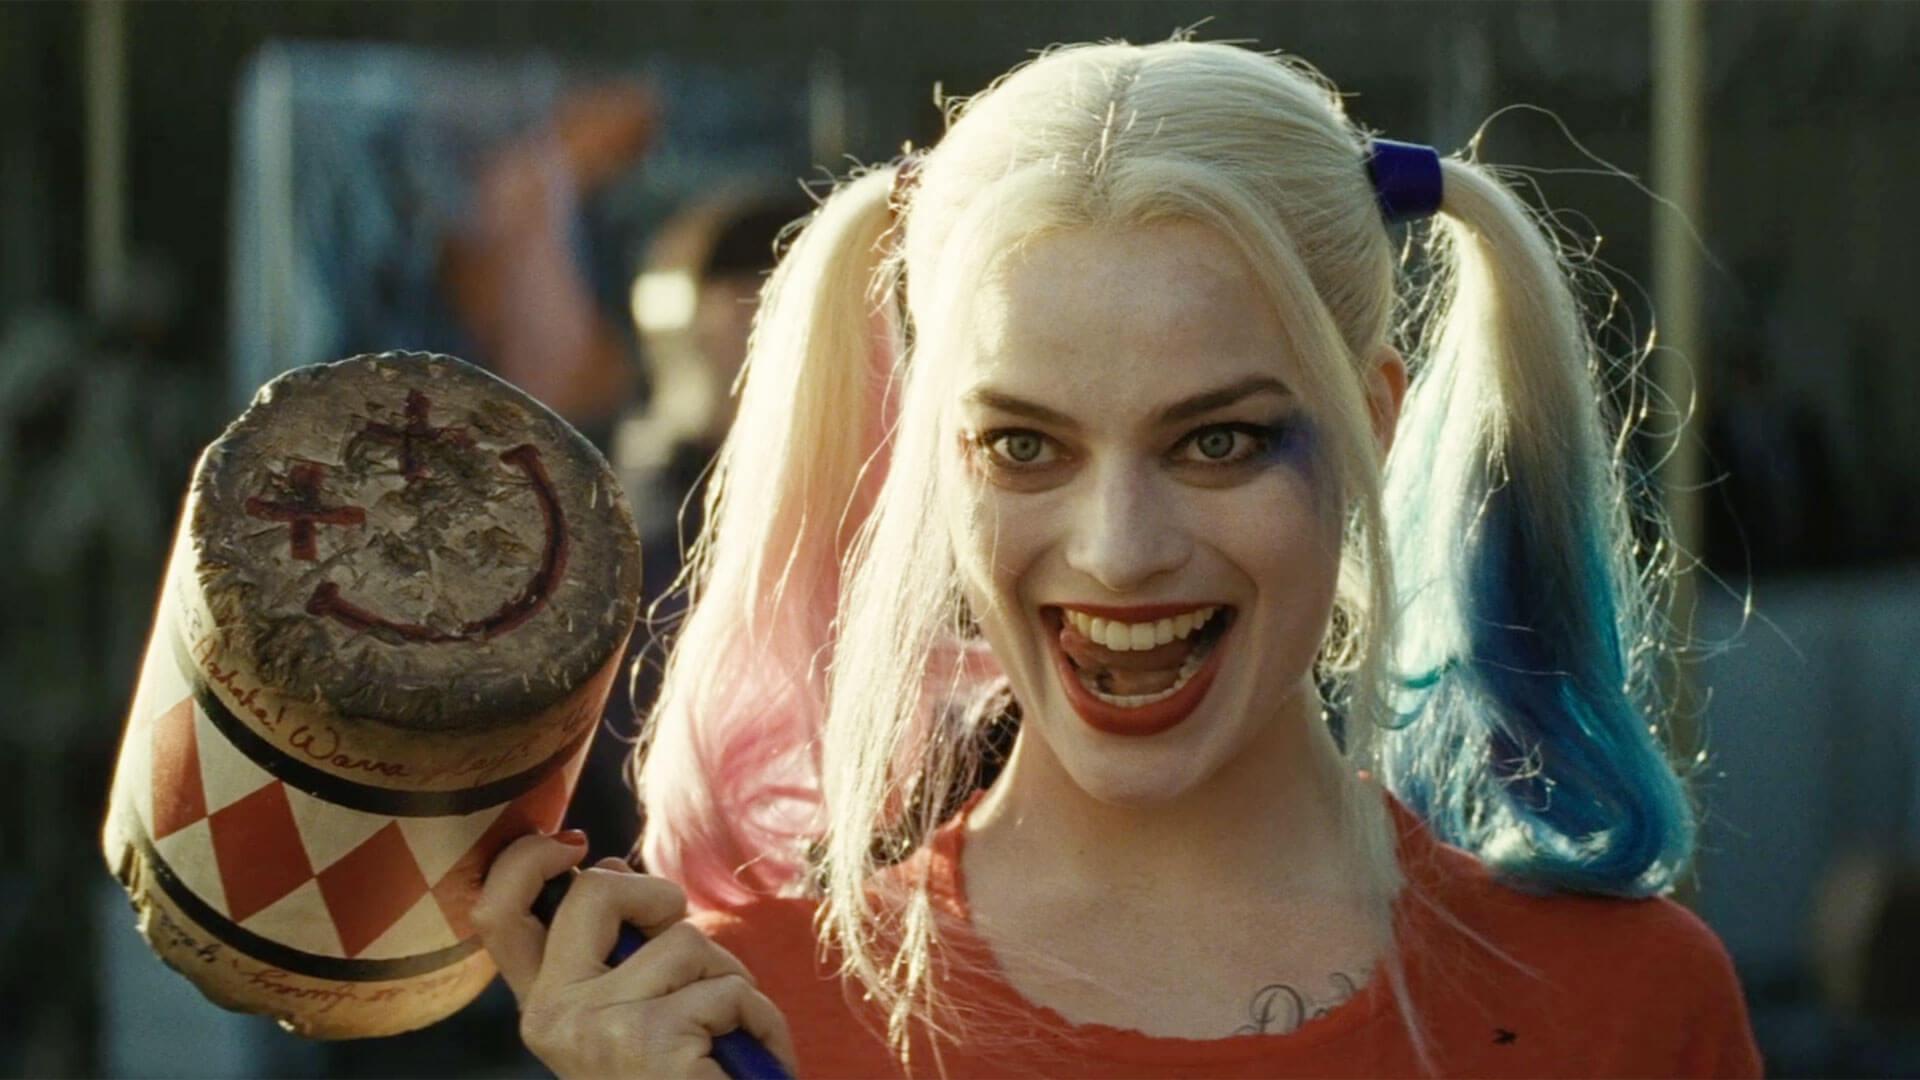 Harley Quinn Gets Her Own Spinoff Movie Starring Margot Robbie